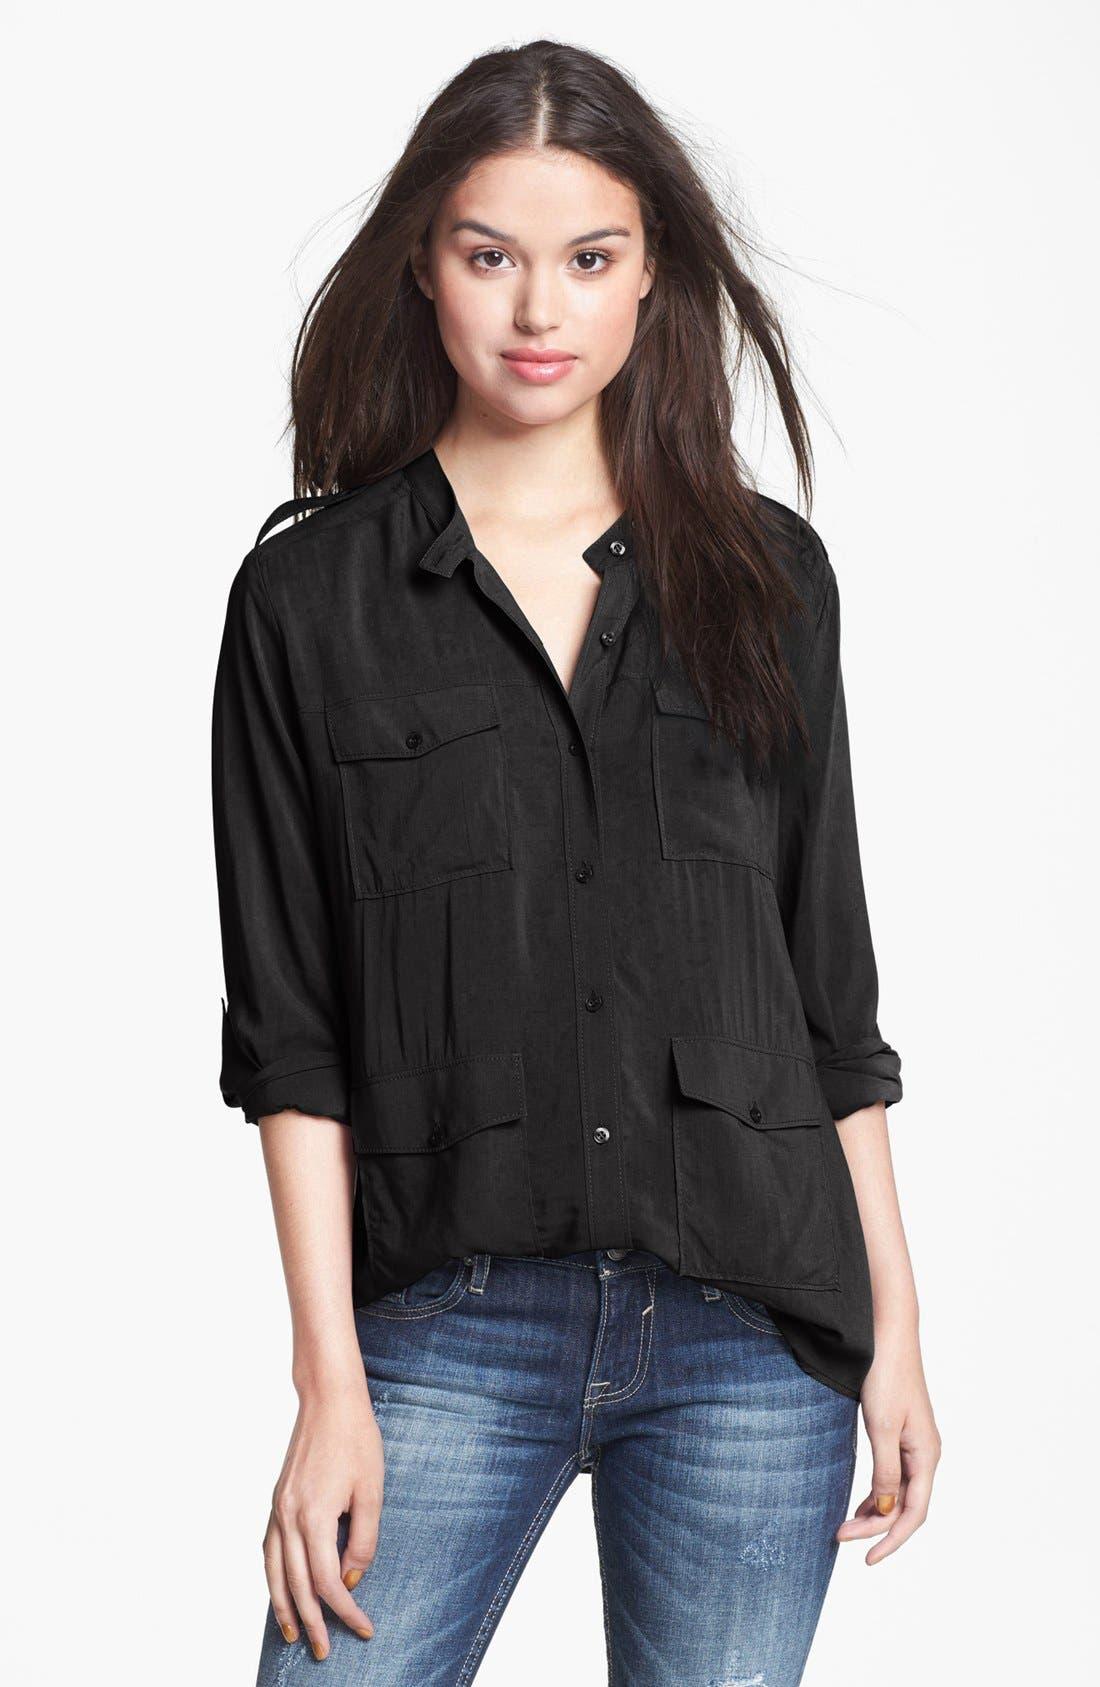 Alternate Image 1 Selected - Rubbish® Four Pocket Shirt (Juniors)